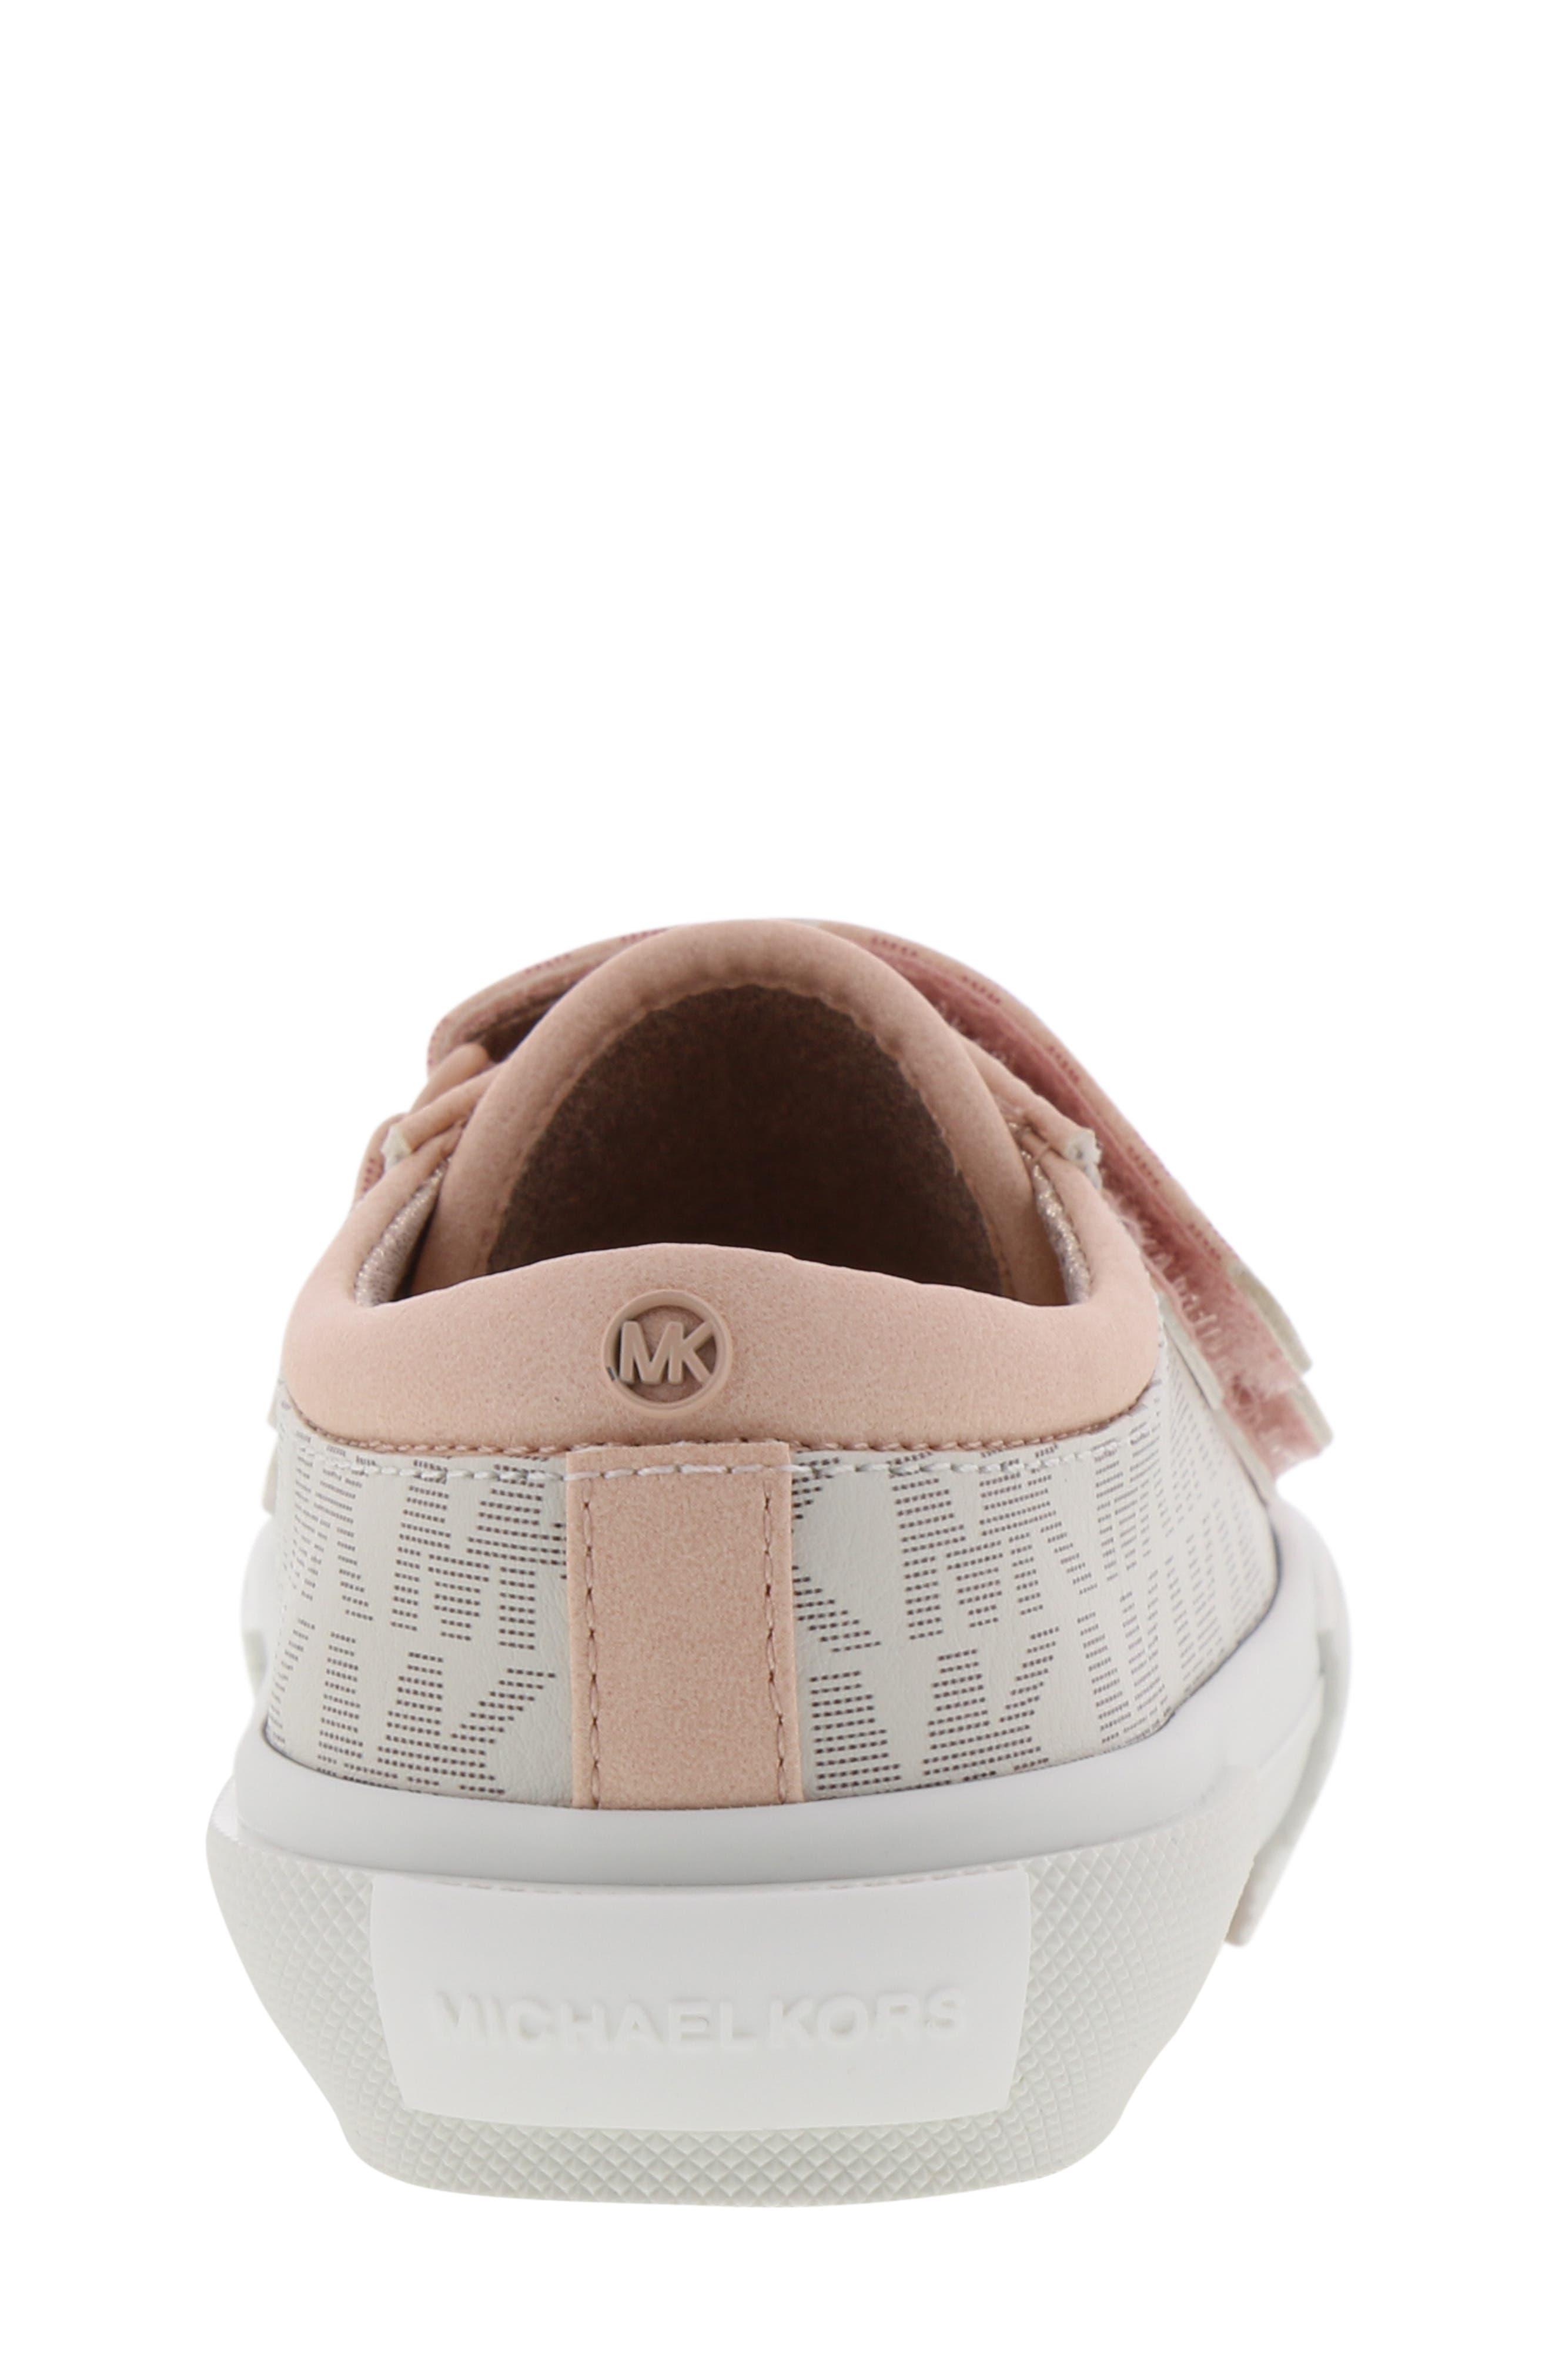 Ima Double Platform Sneaker,                             Alternate thumbnail 7, color,                             VANILLA/ BLUSH